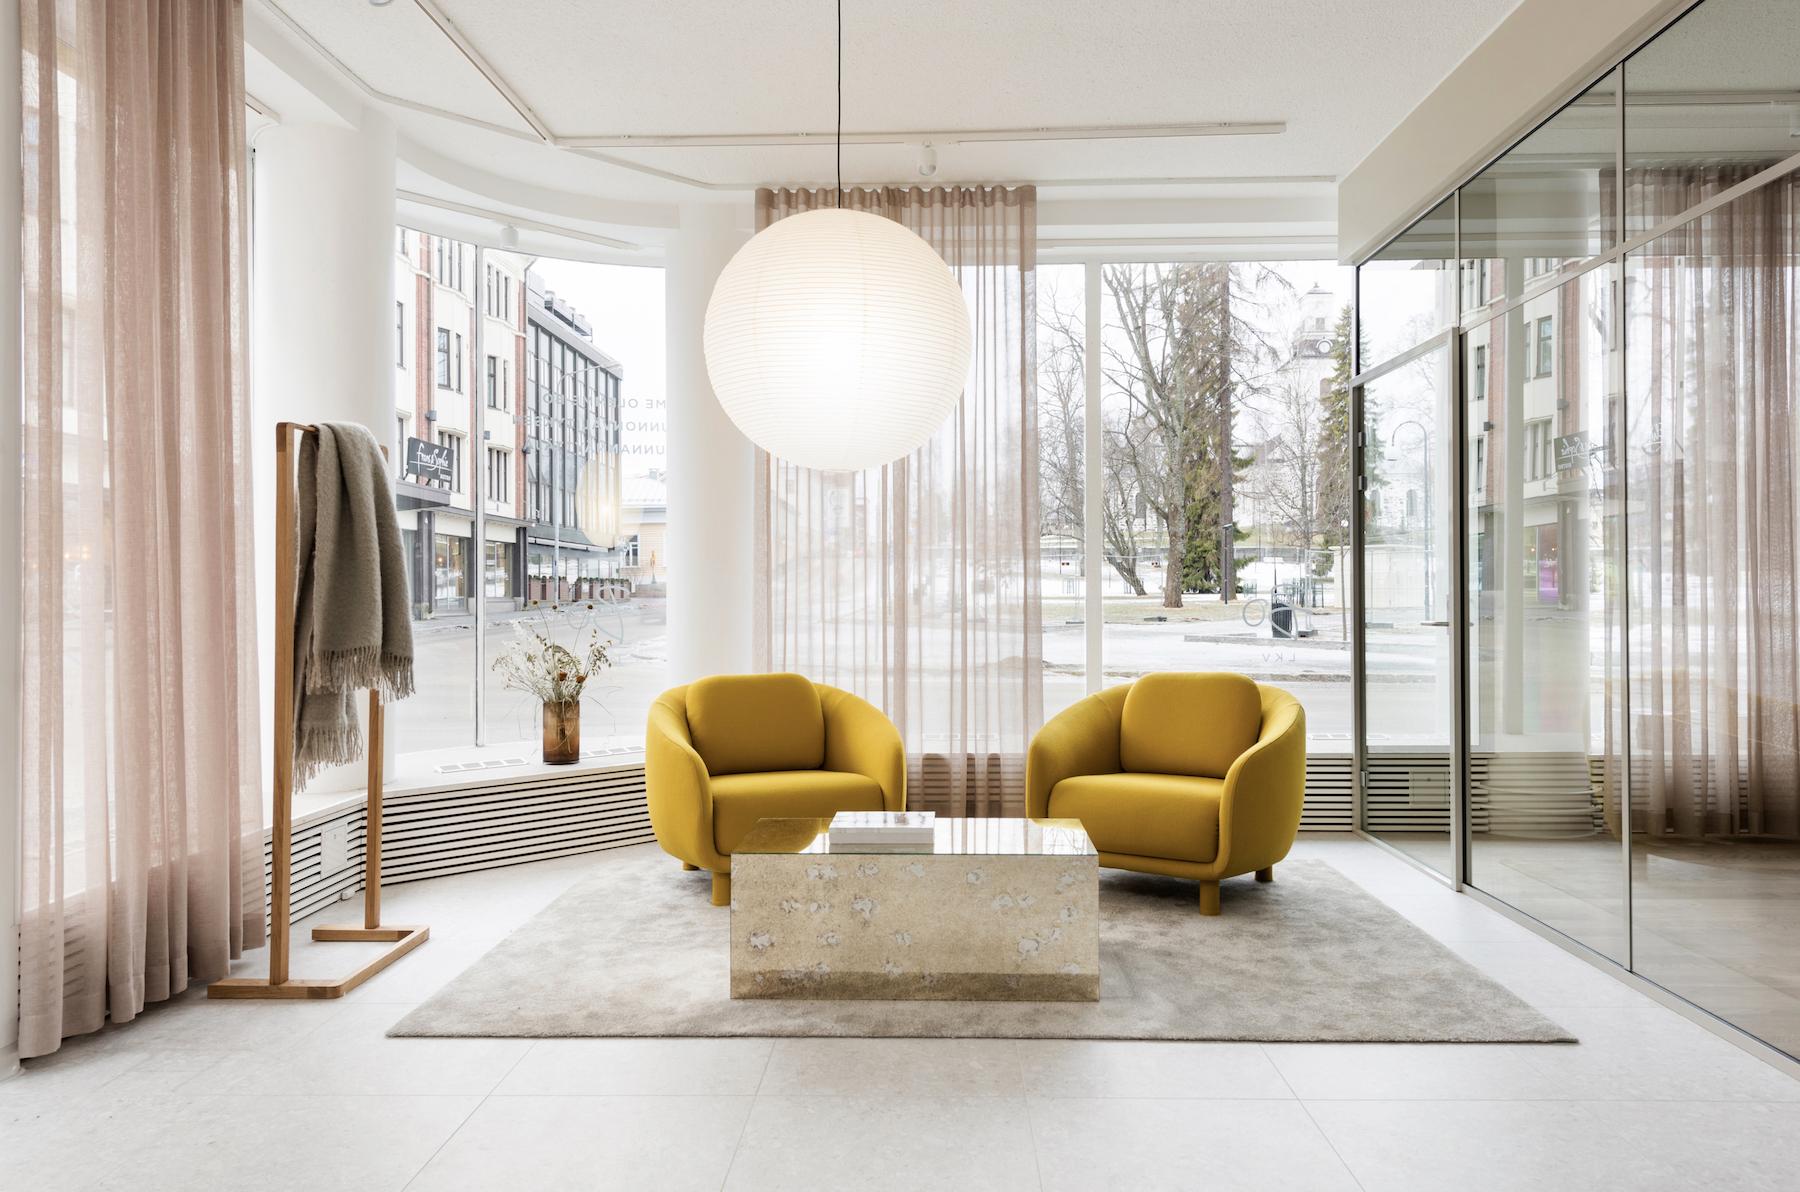 toimiston-sisustus-bo-lkv-kuopio-lounge